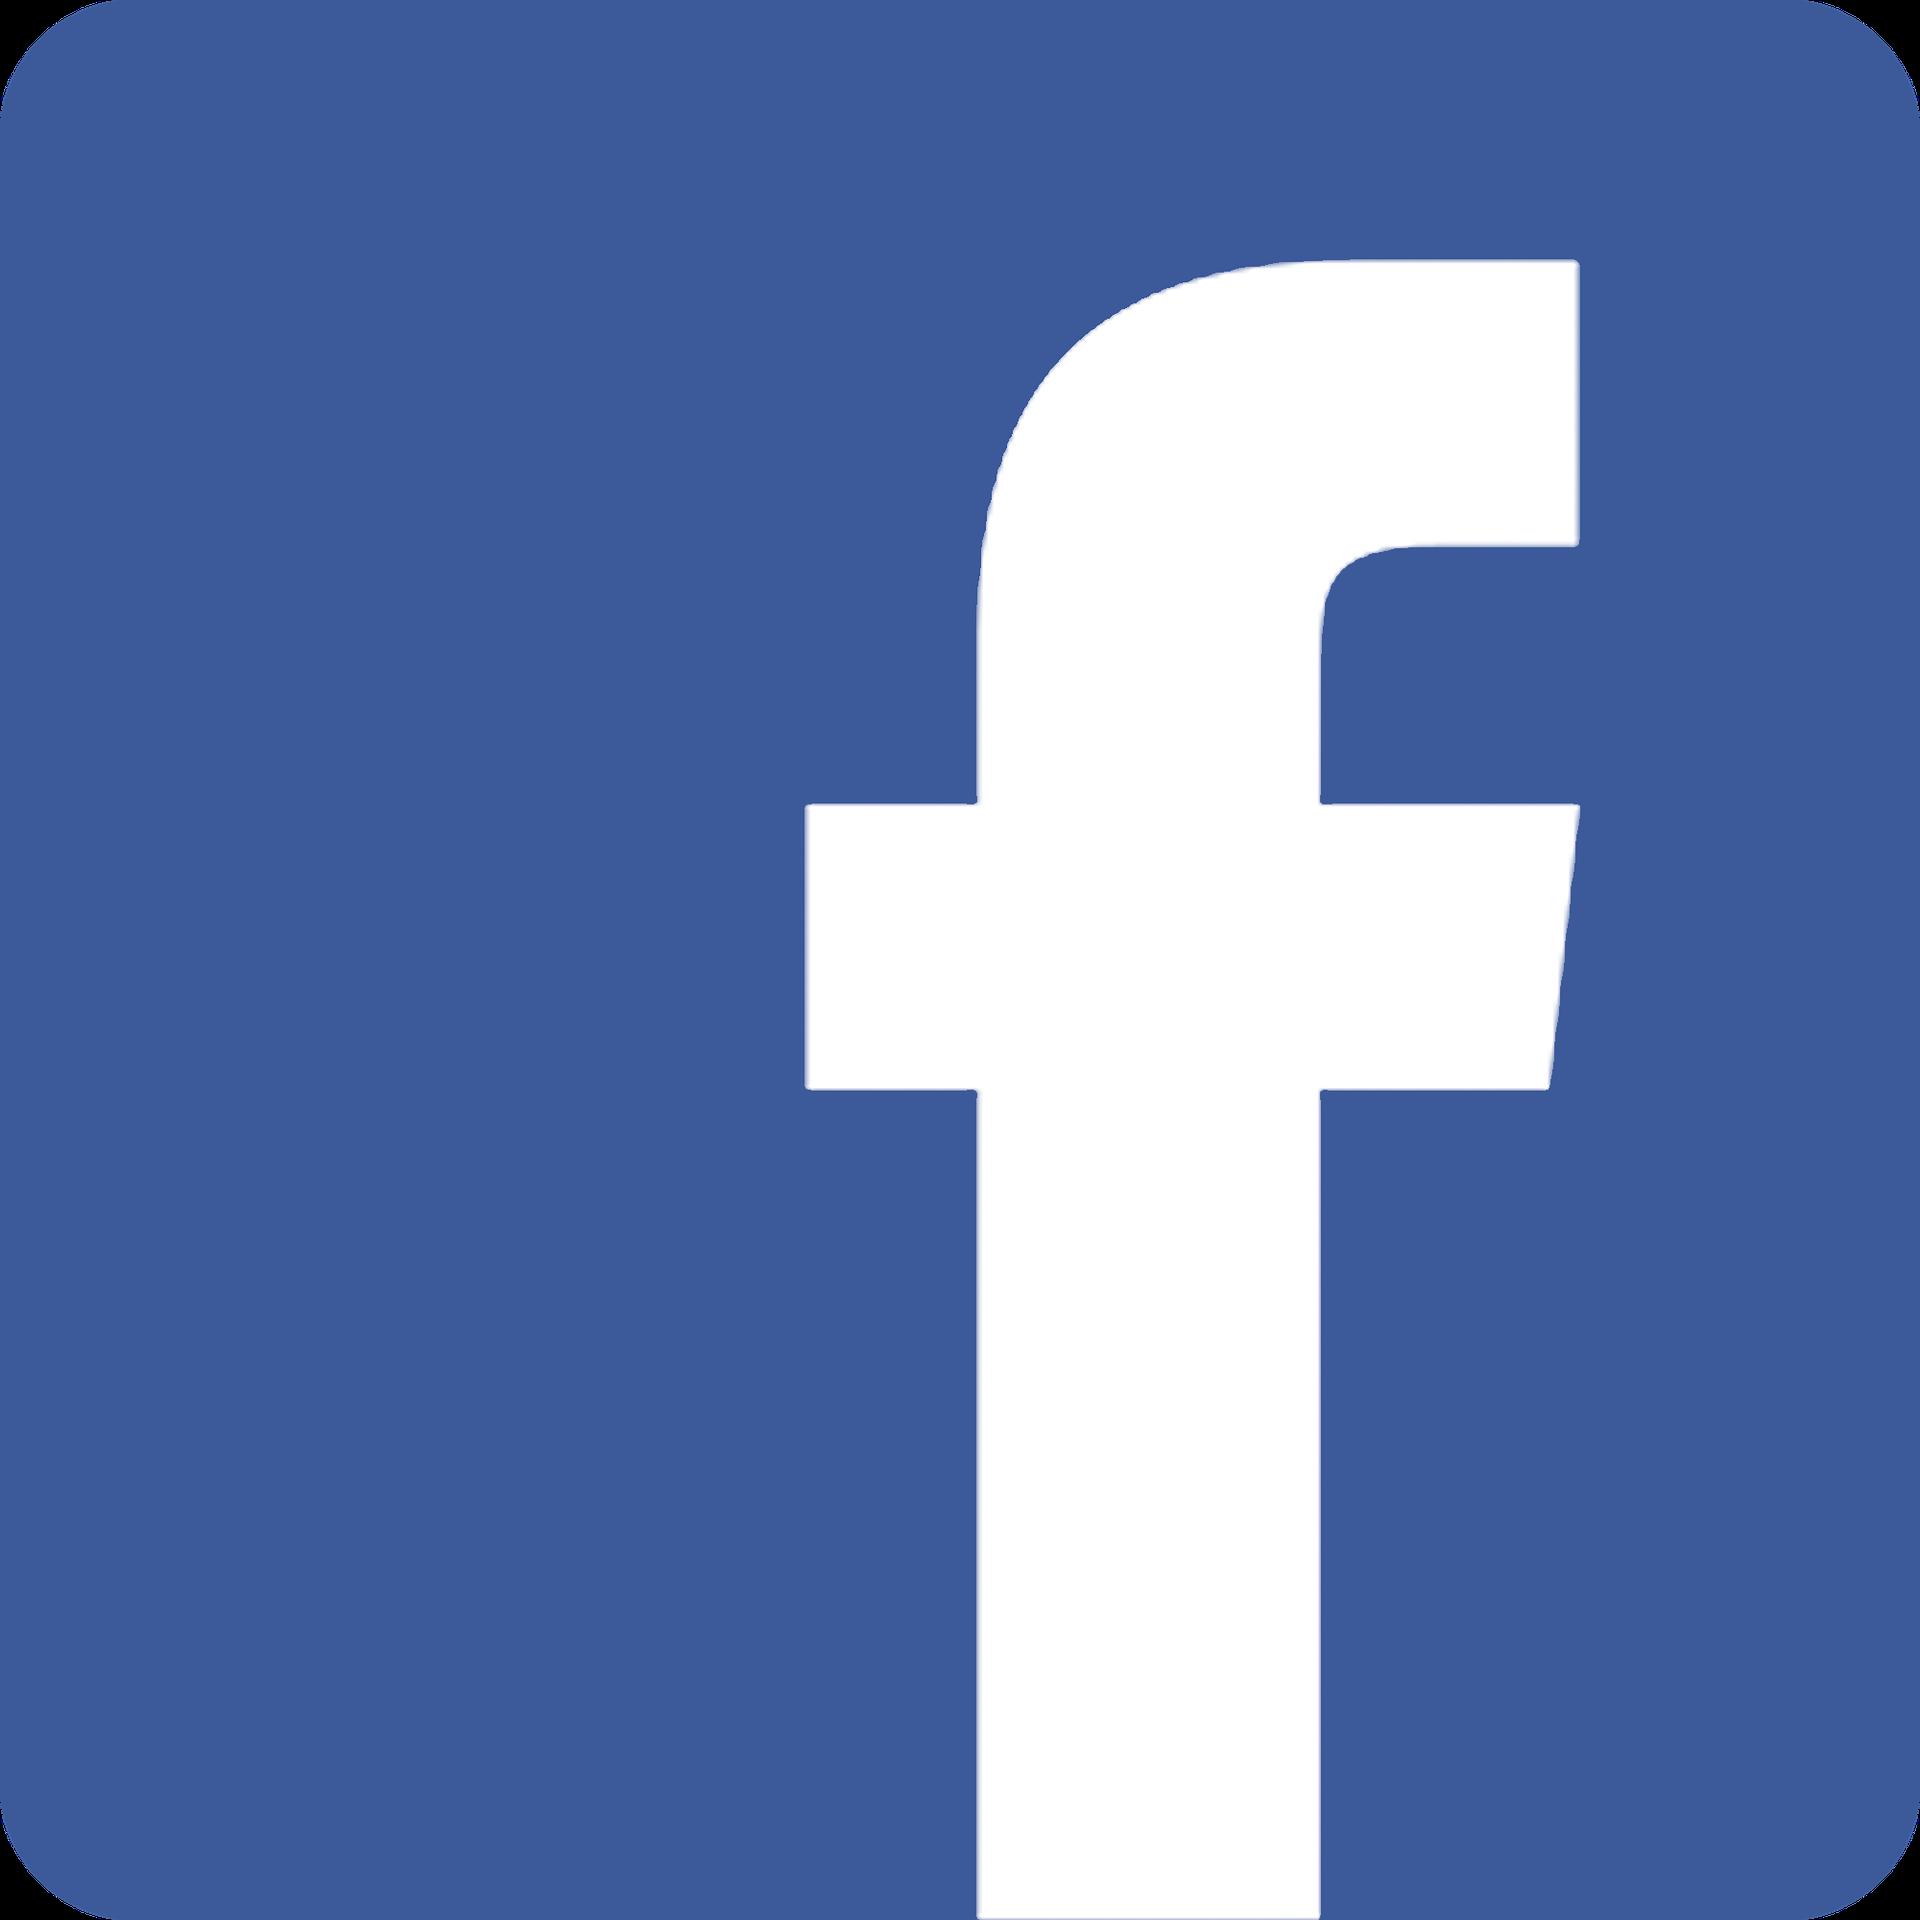 Facebook 770688 1920